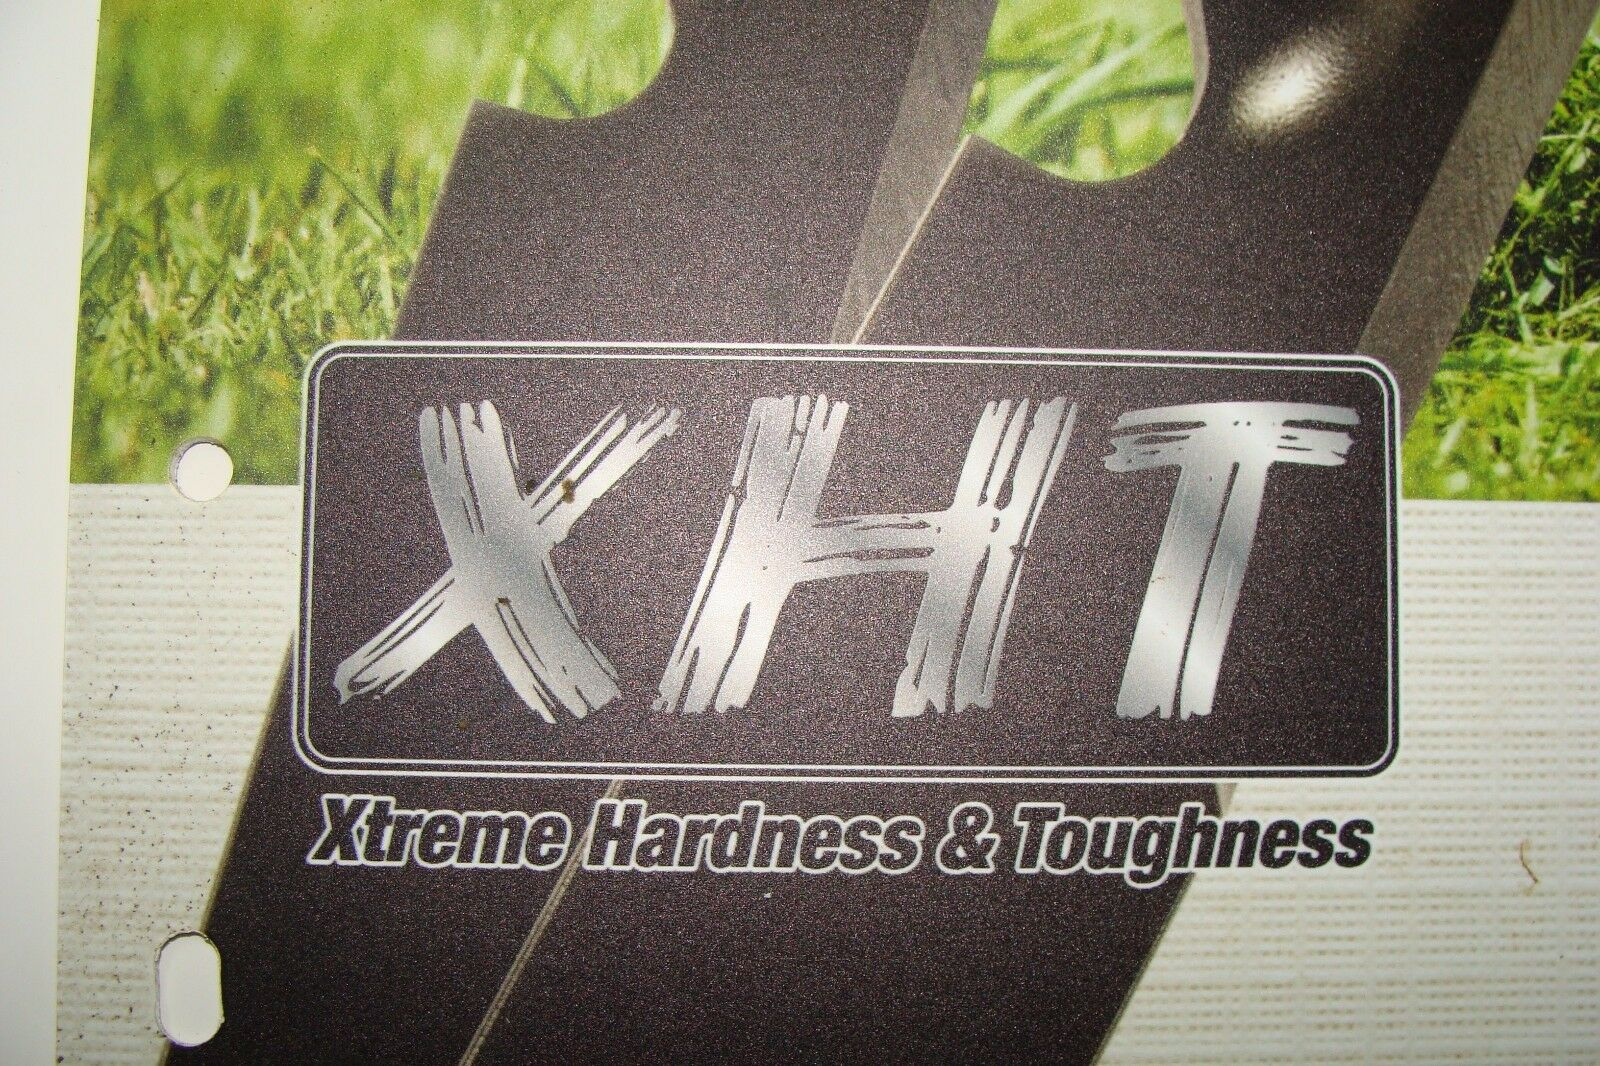 "3 REPL XHT HD USA BLADES EXCEL HUSTLER 797696 601124 54"" RAPTOR SD FASTRAK X"